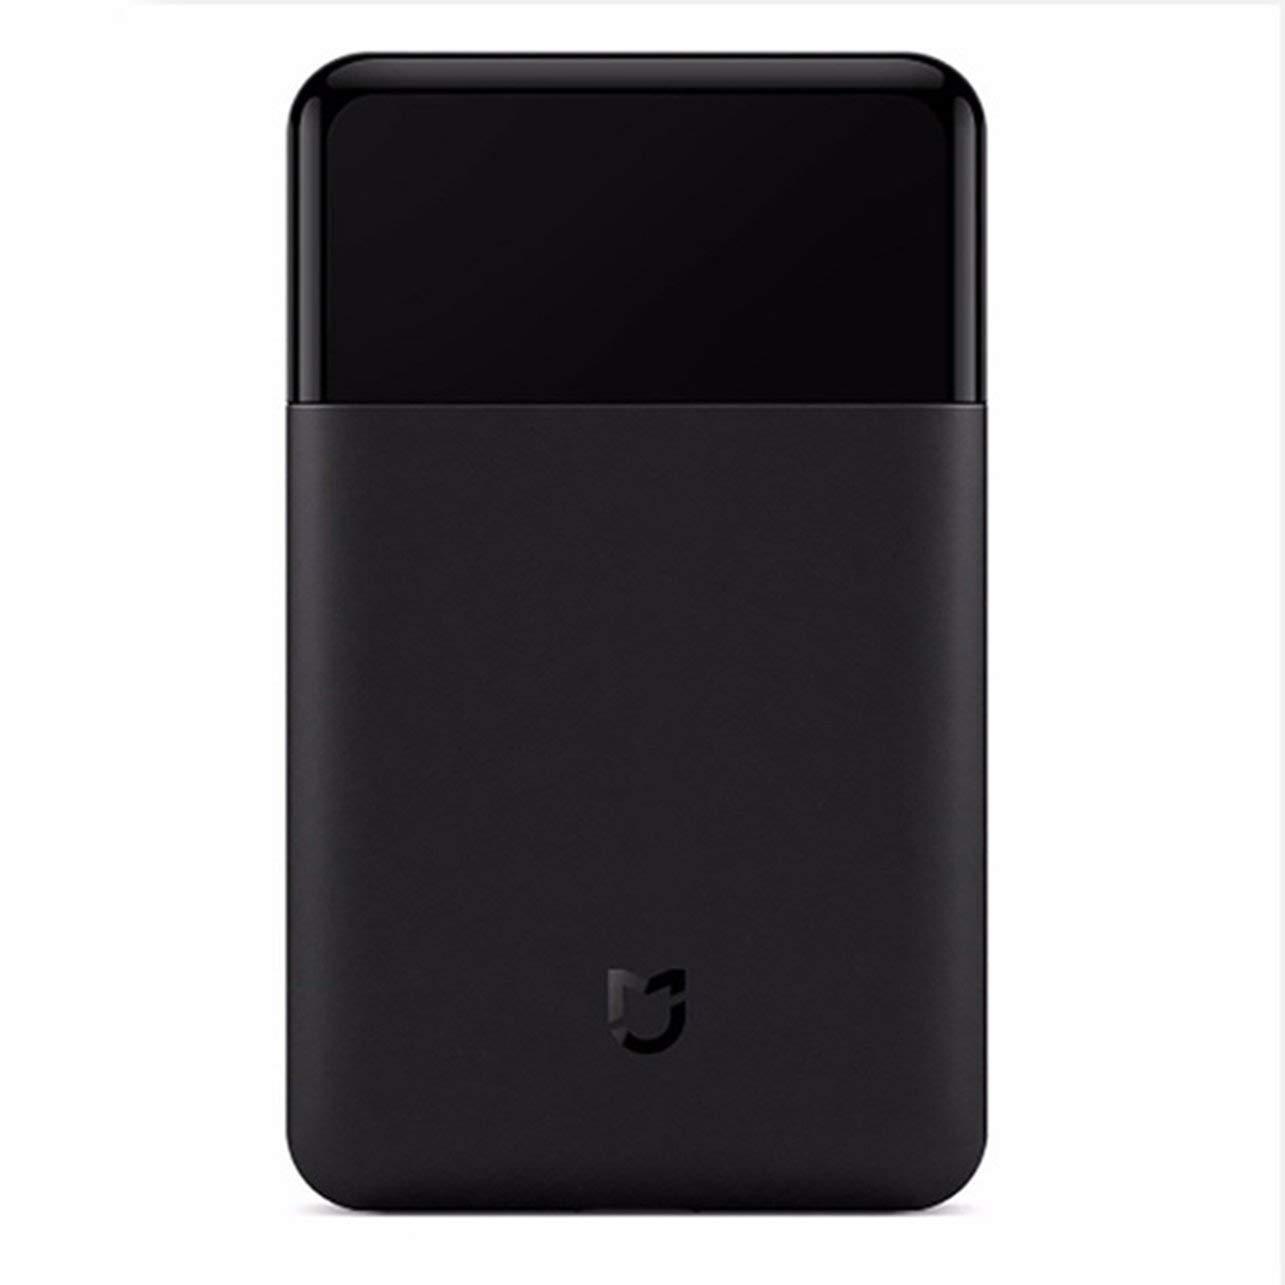 Xiaomi Mijia Mini Portable Men Electric Shaver Razor Fully Metal Body Japan Bit USB Type-C Rechargeable Travel Shaver(Color:Black) WOSOSYEYO